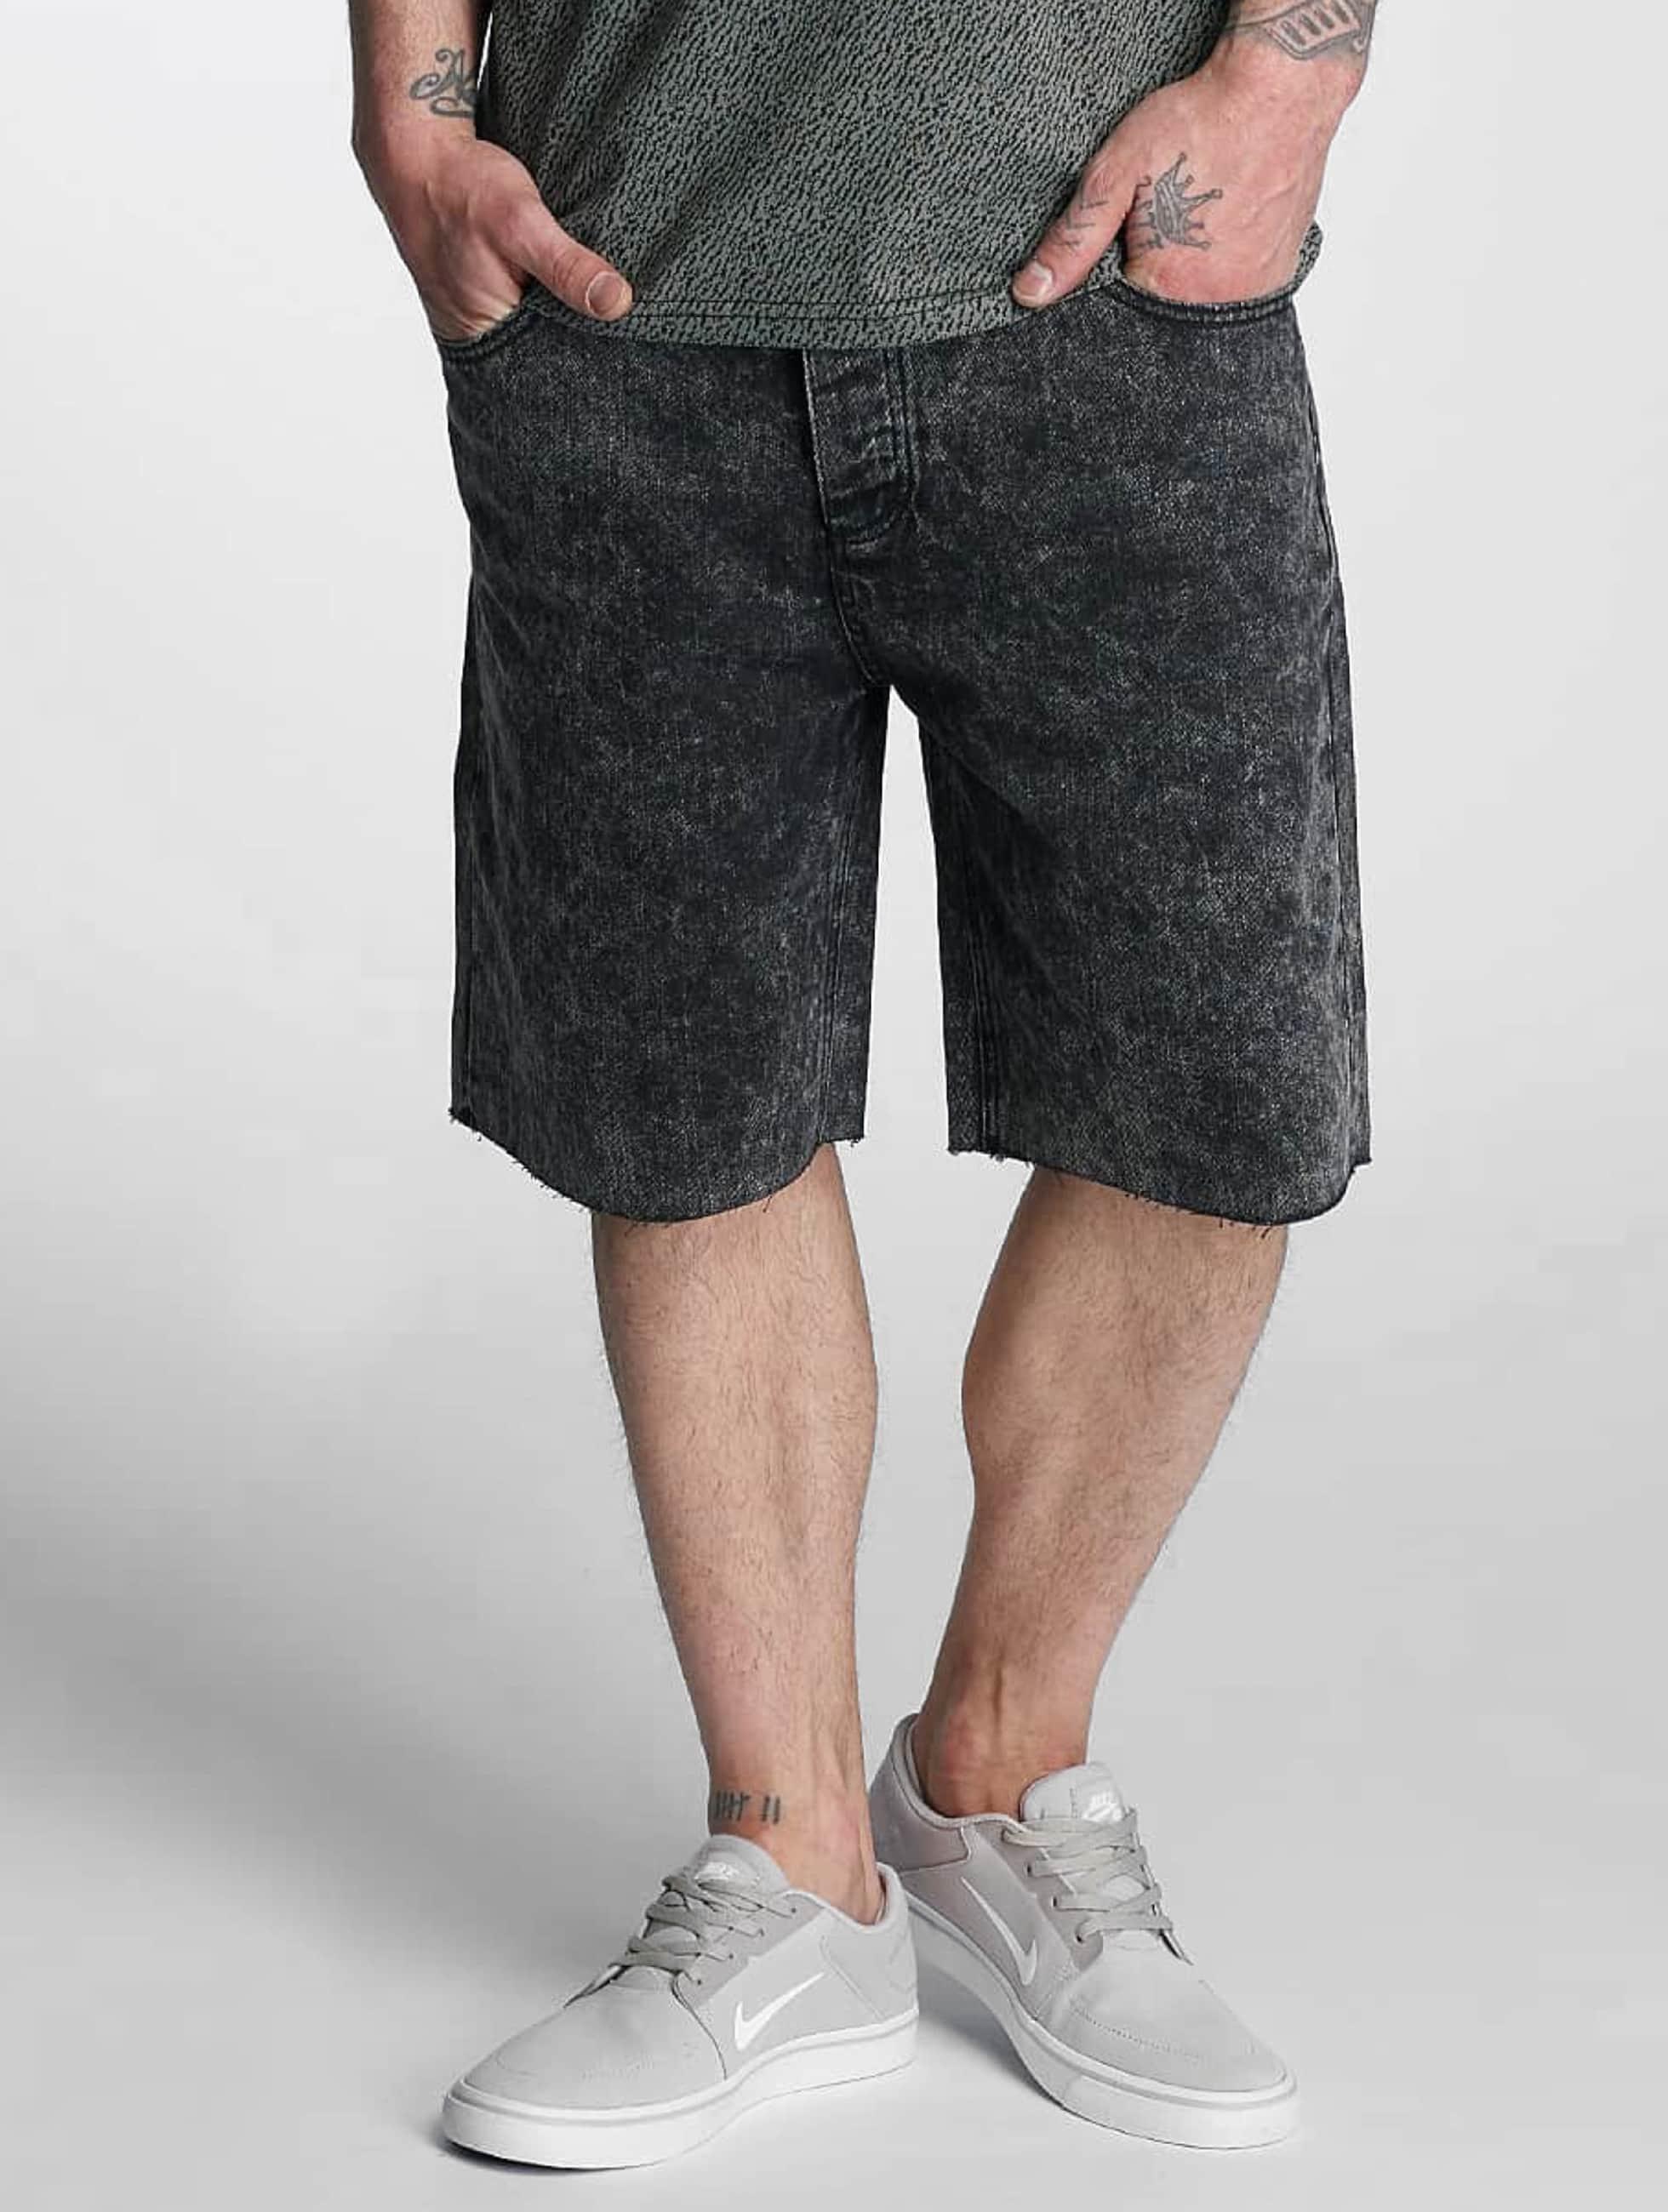 Cayler & Sons Männer Shorts All DD in schwarz